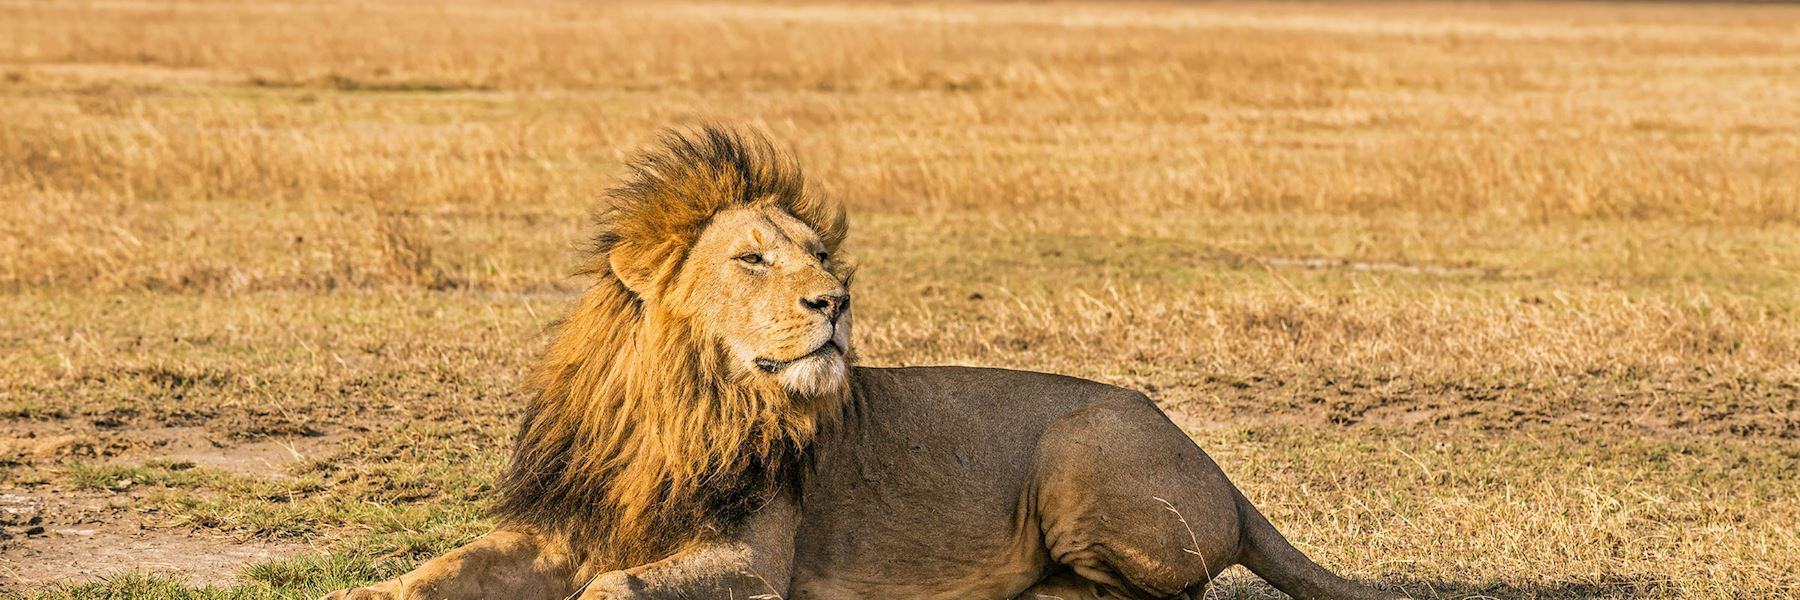 Visit Ngorongoro Crater, Tanzania